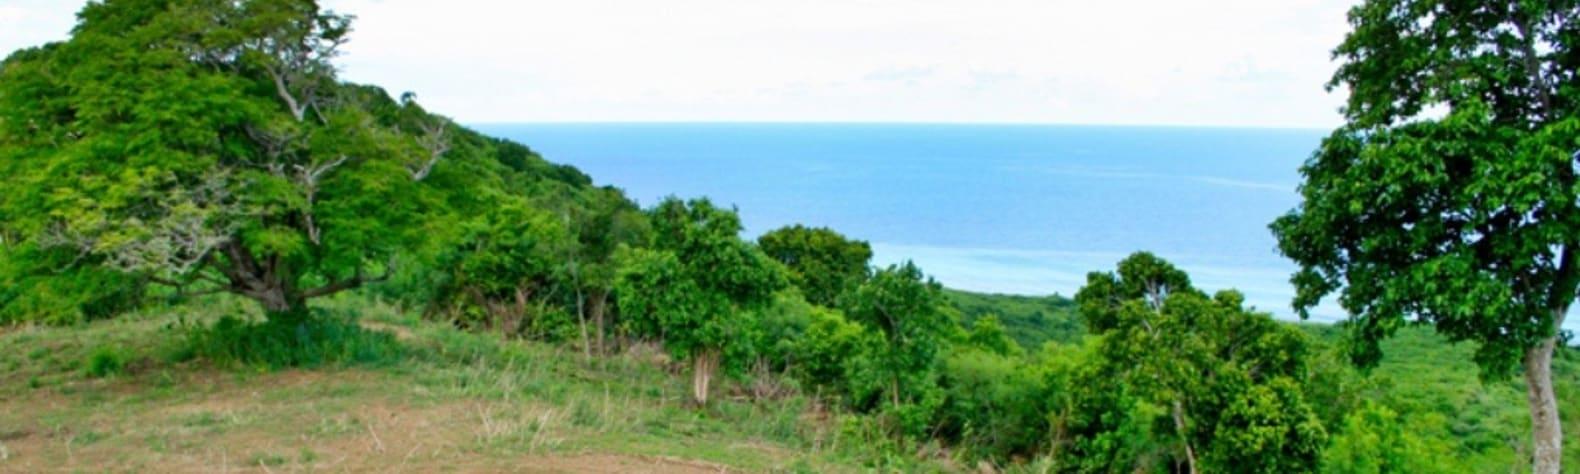 Ronald R.'s Land